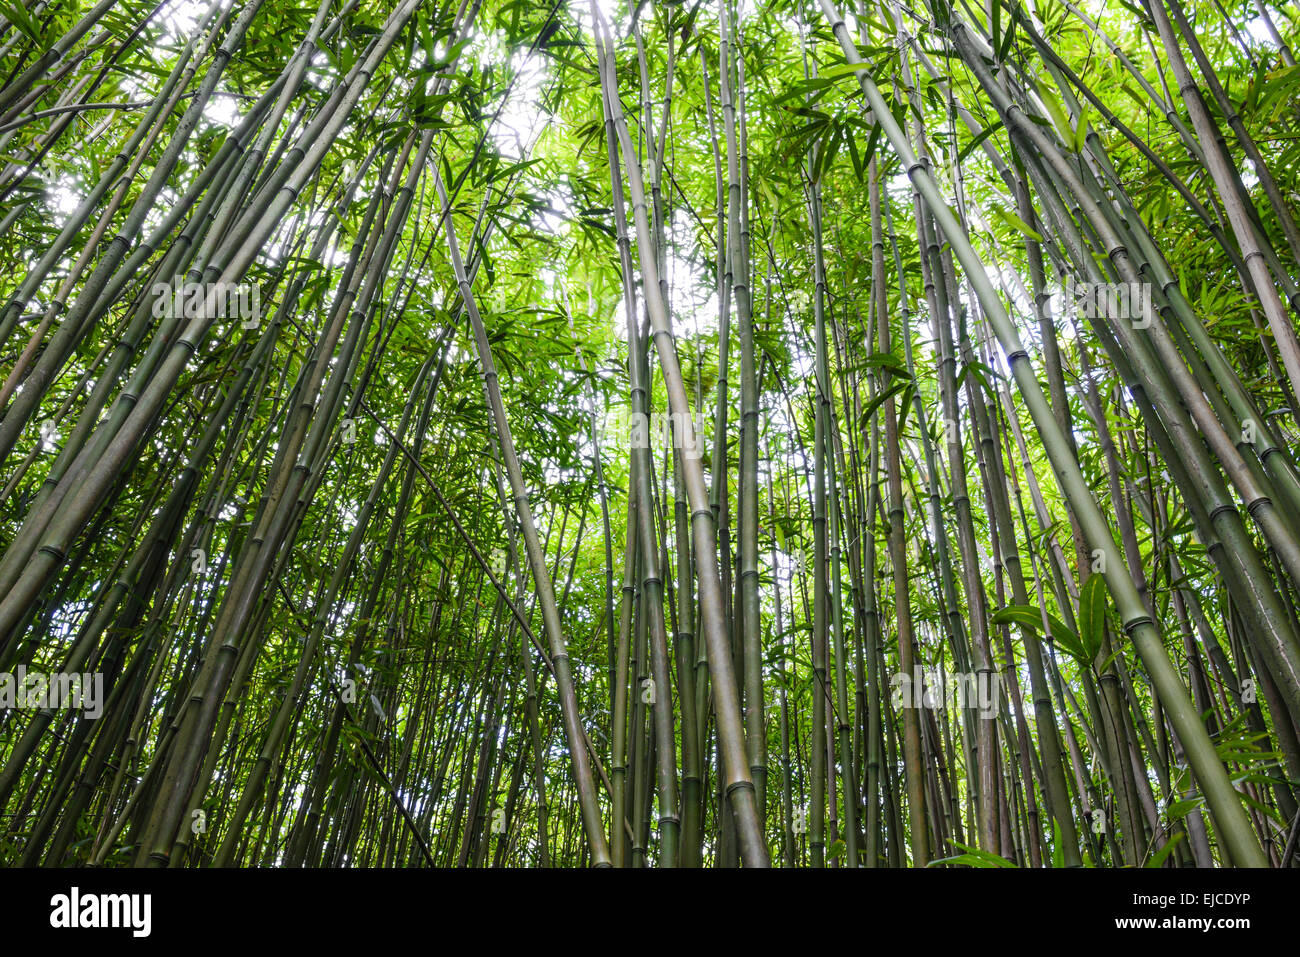 Bambuswald In Maui Hawaii Stockfoto Bild 80179674 Alamy